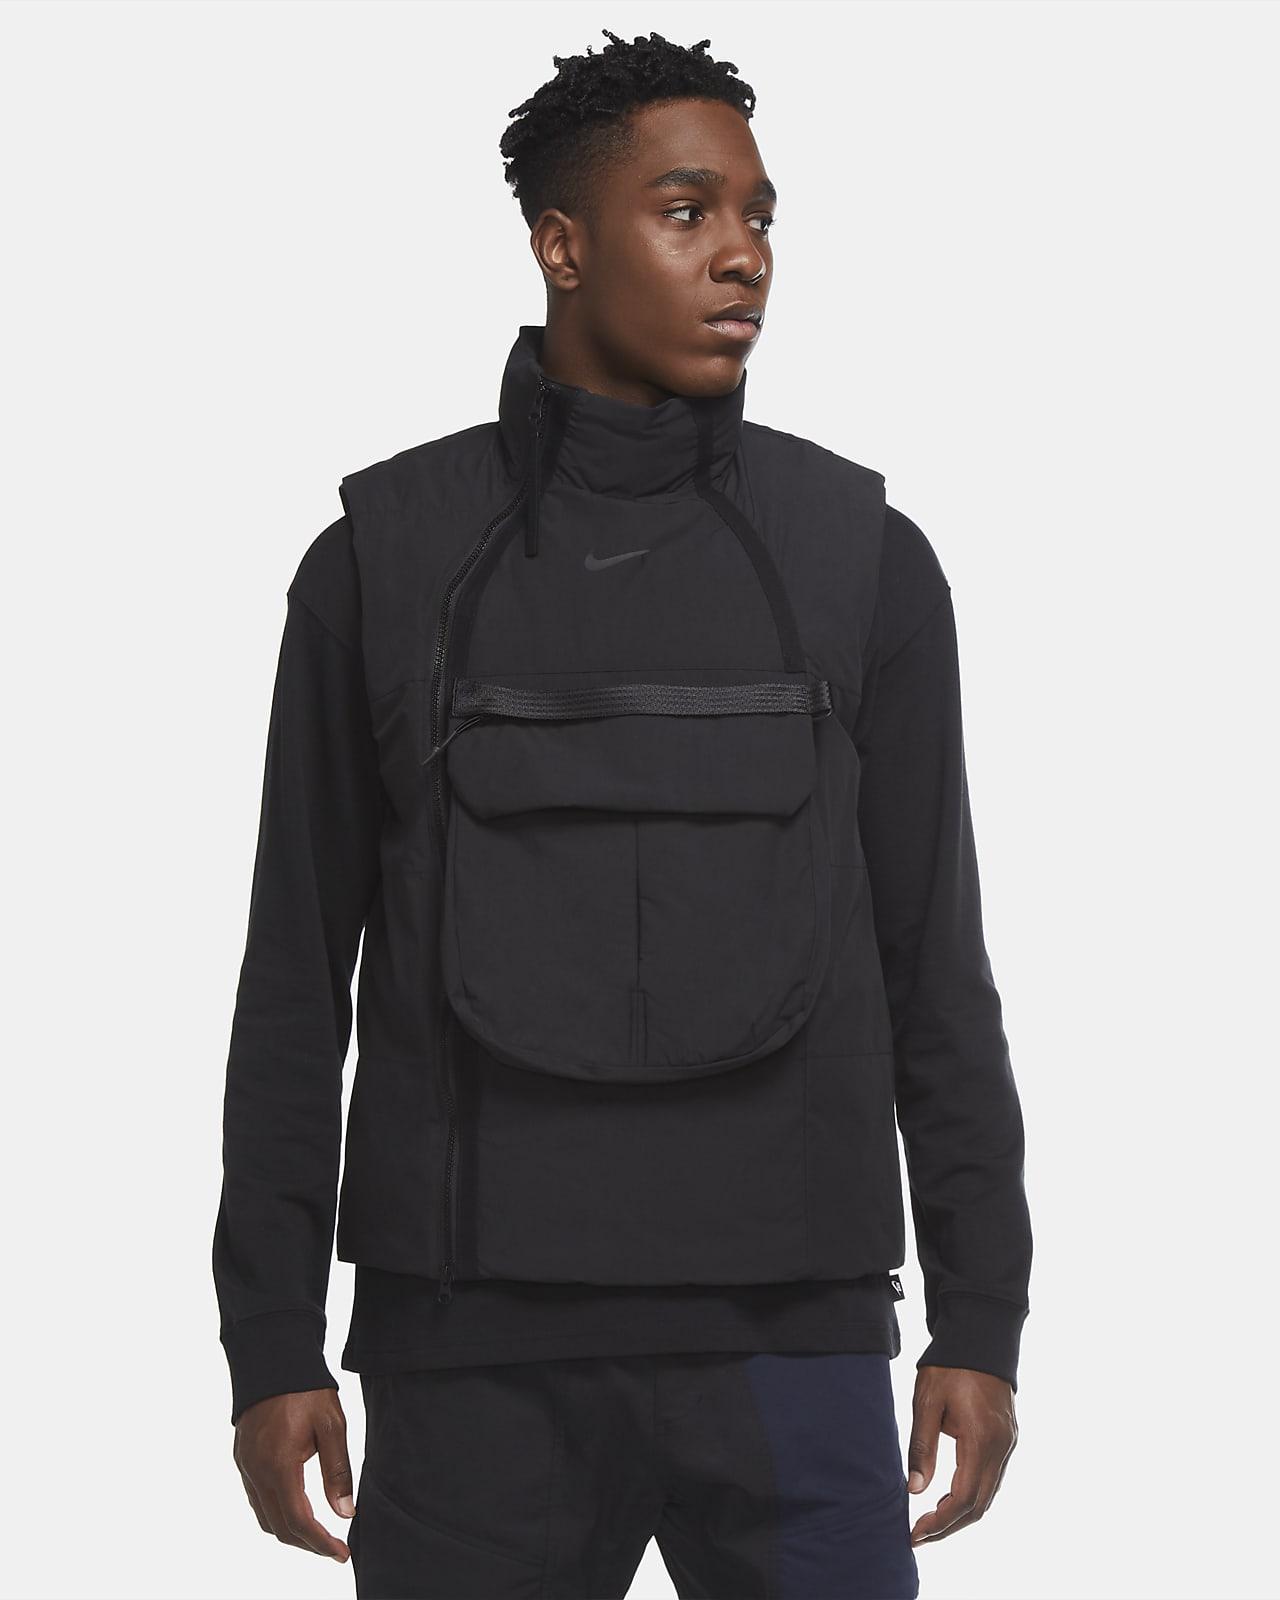 Chaleco con relleno sintético para hombre Nike Sportswear Tech Pack